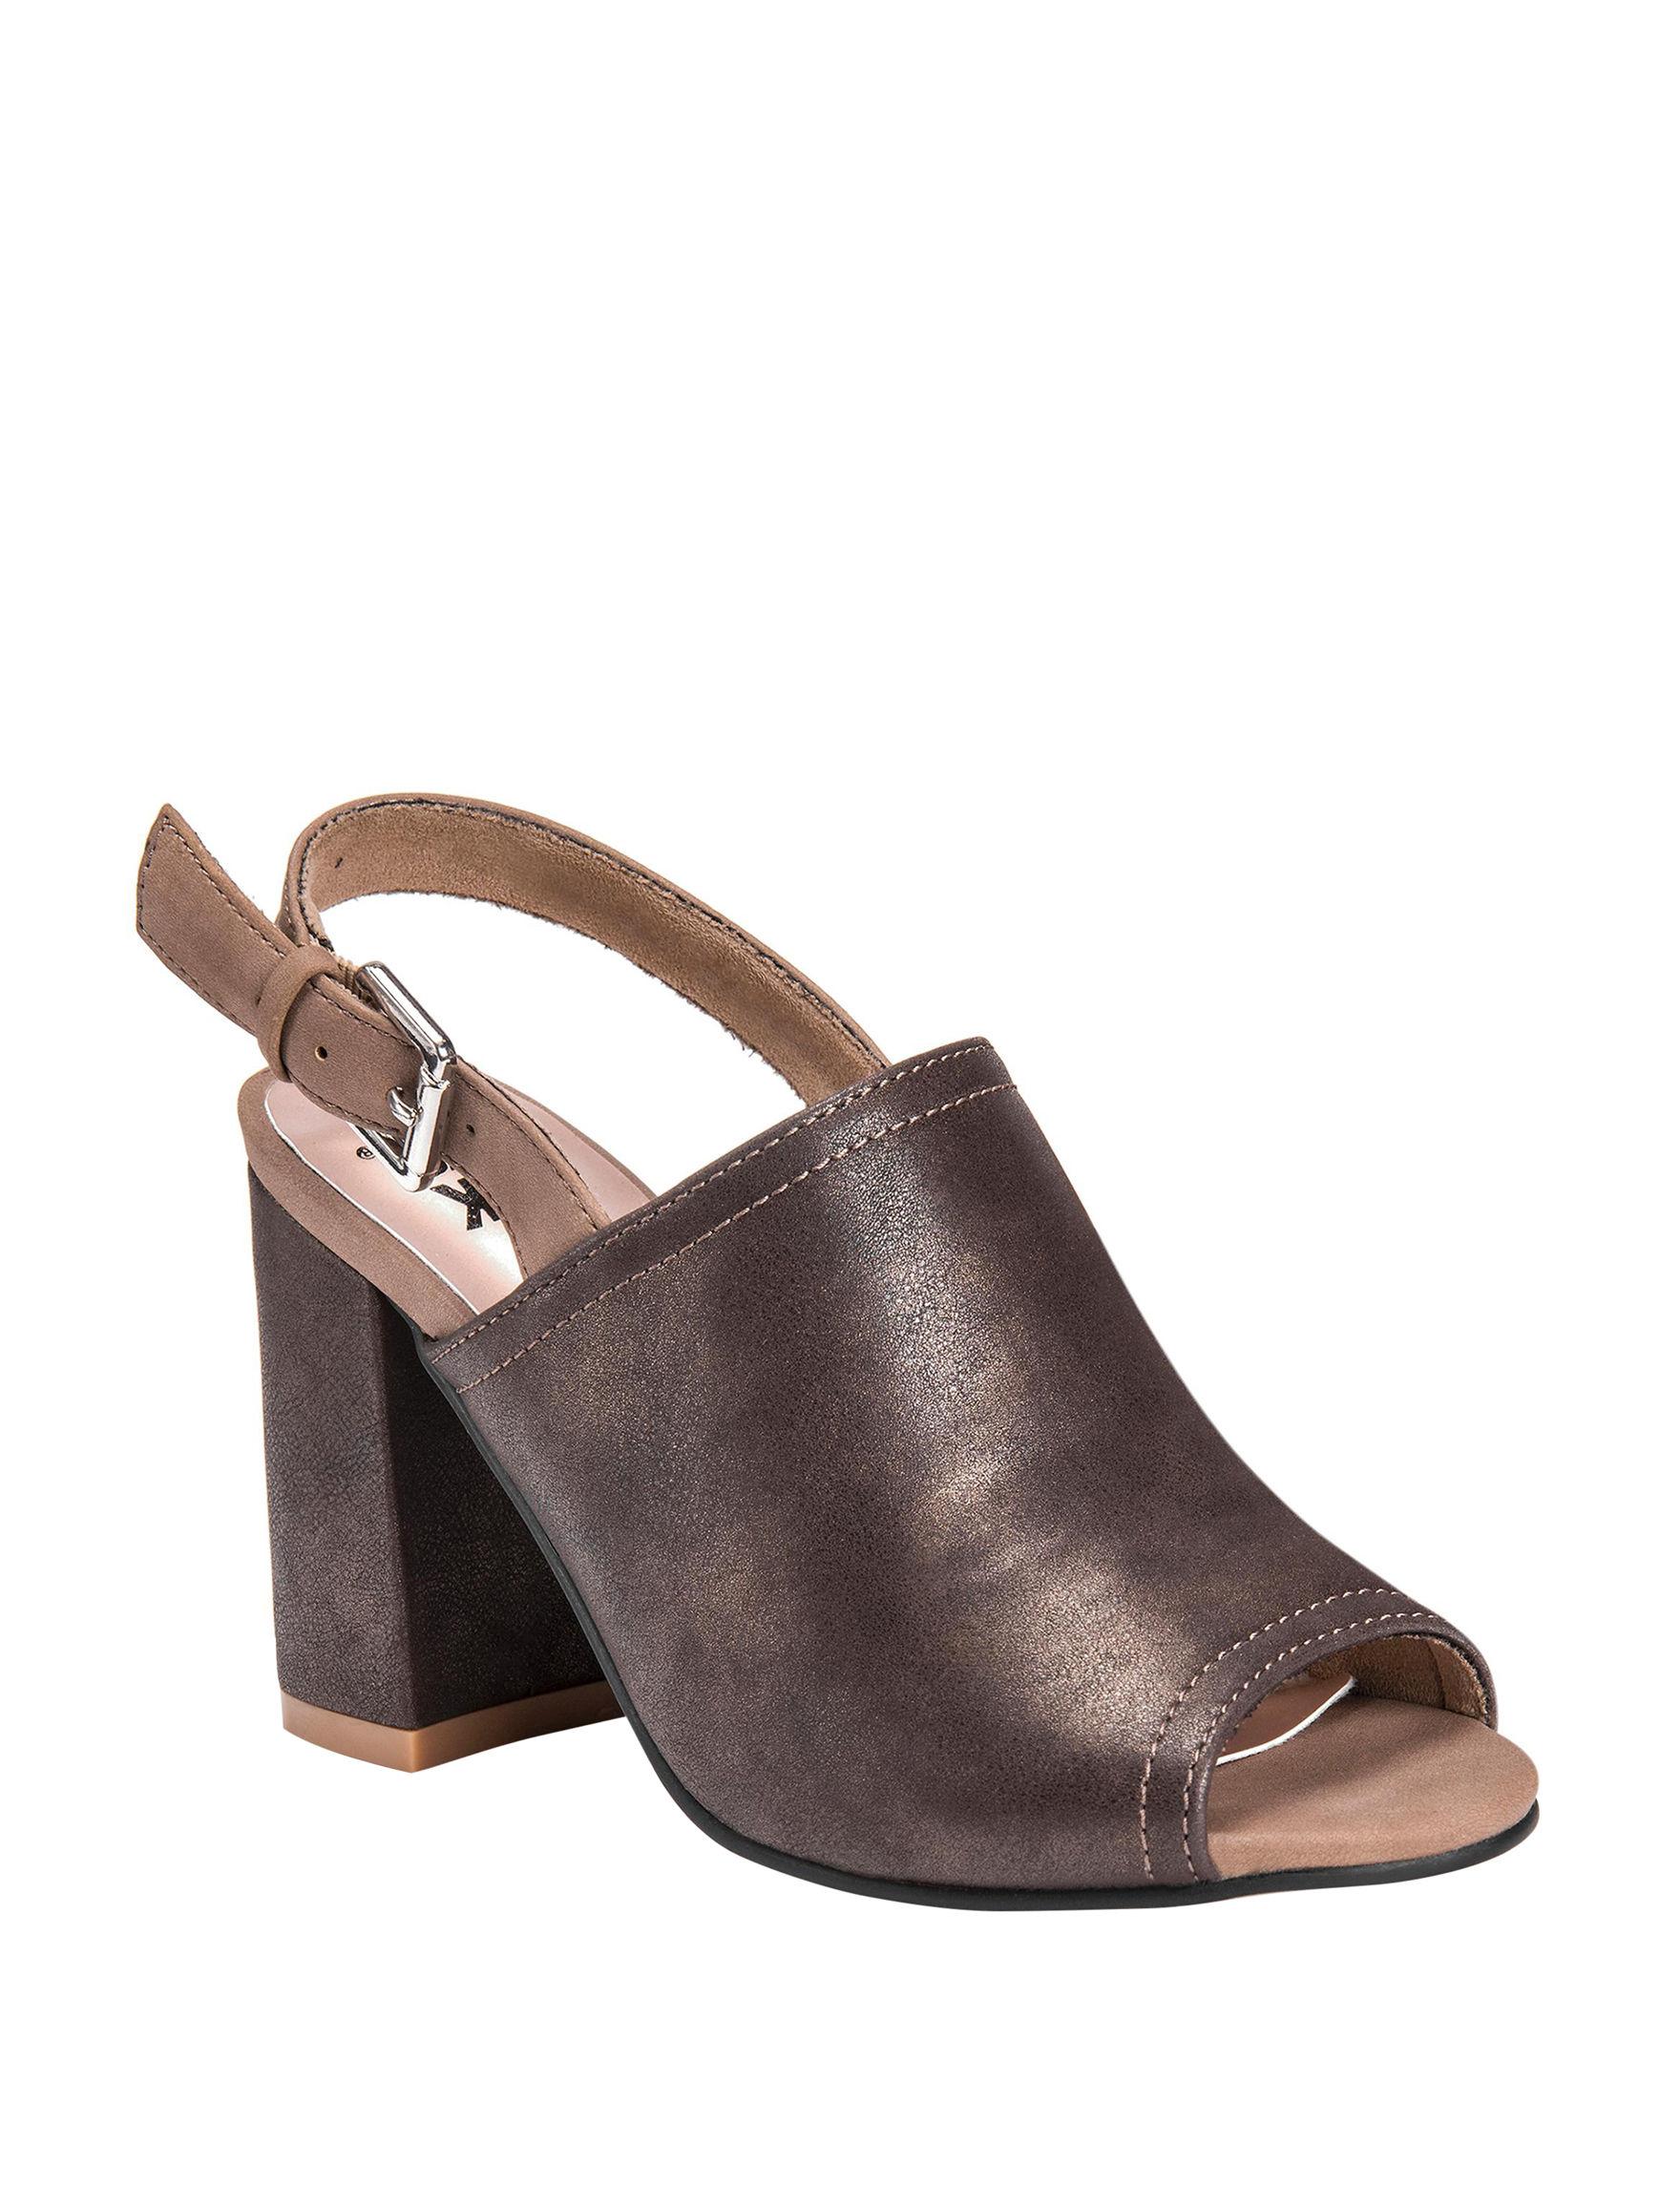 Muk Luks Bronze Heeled Sandals